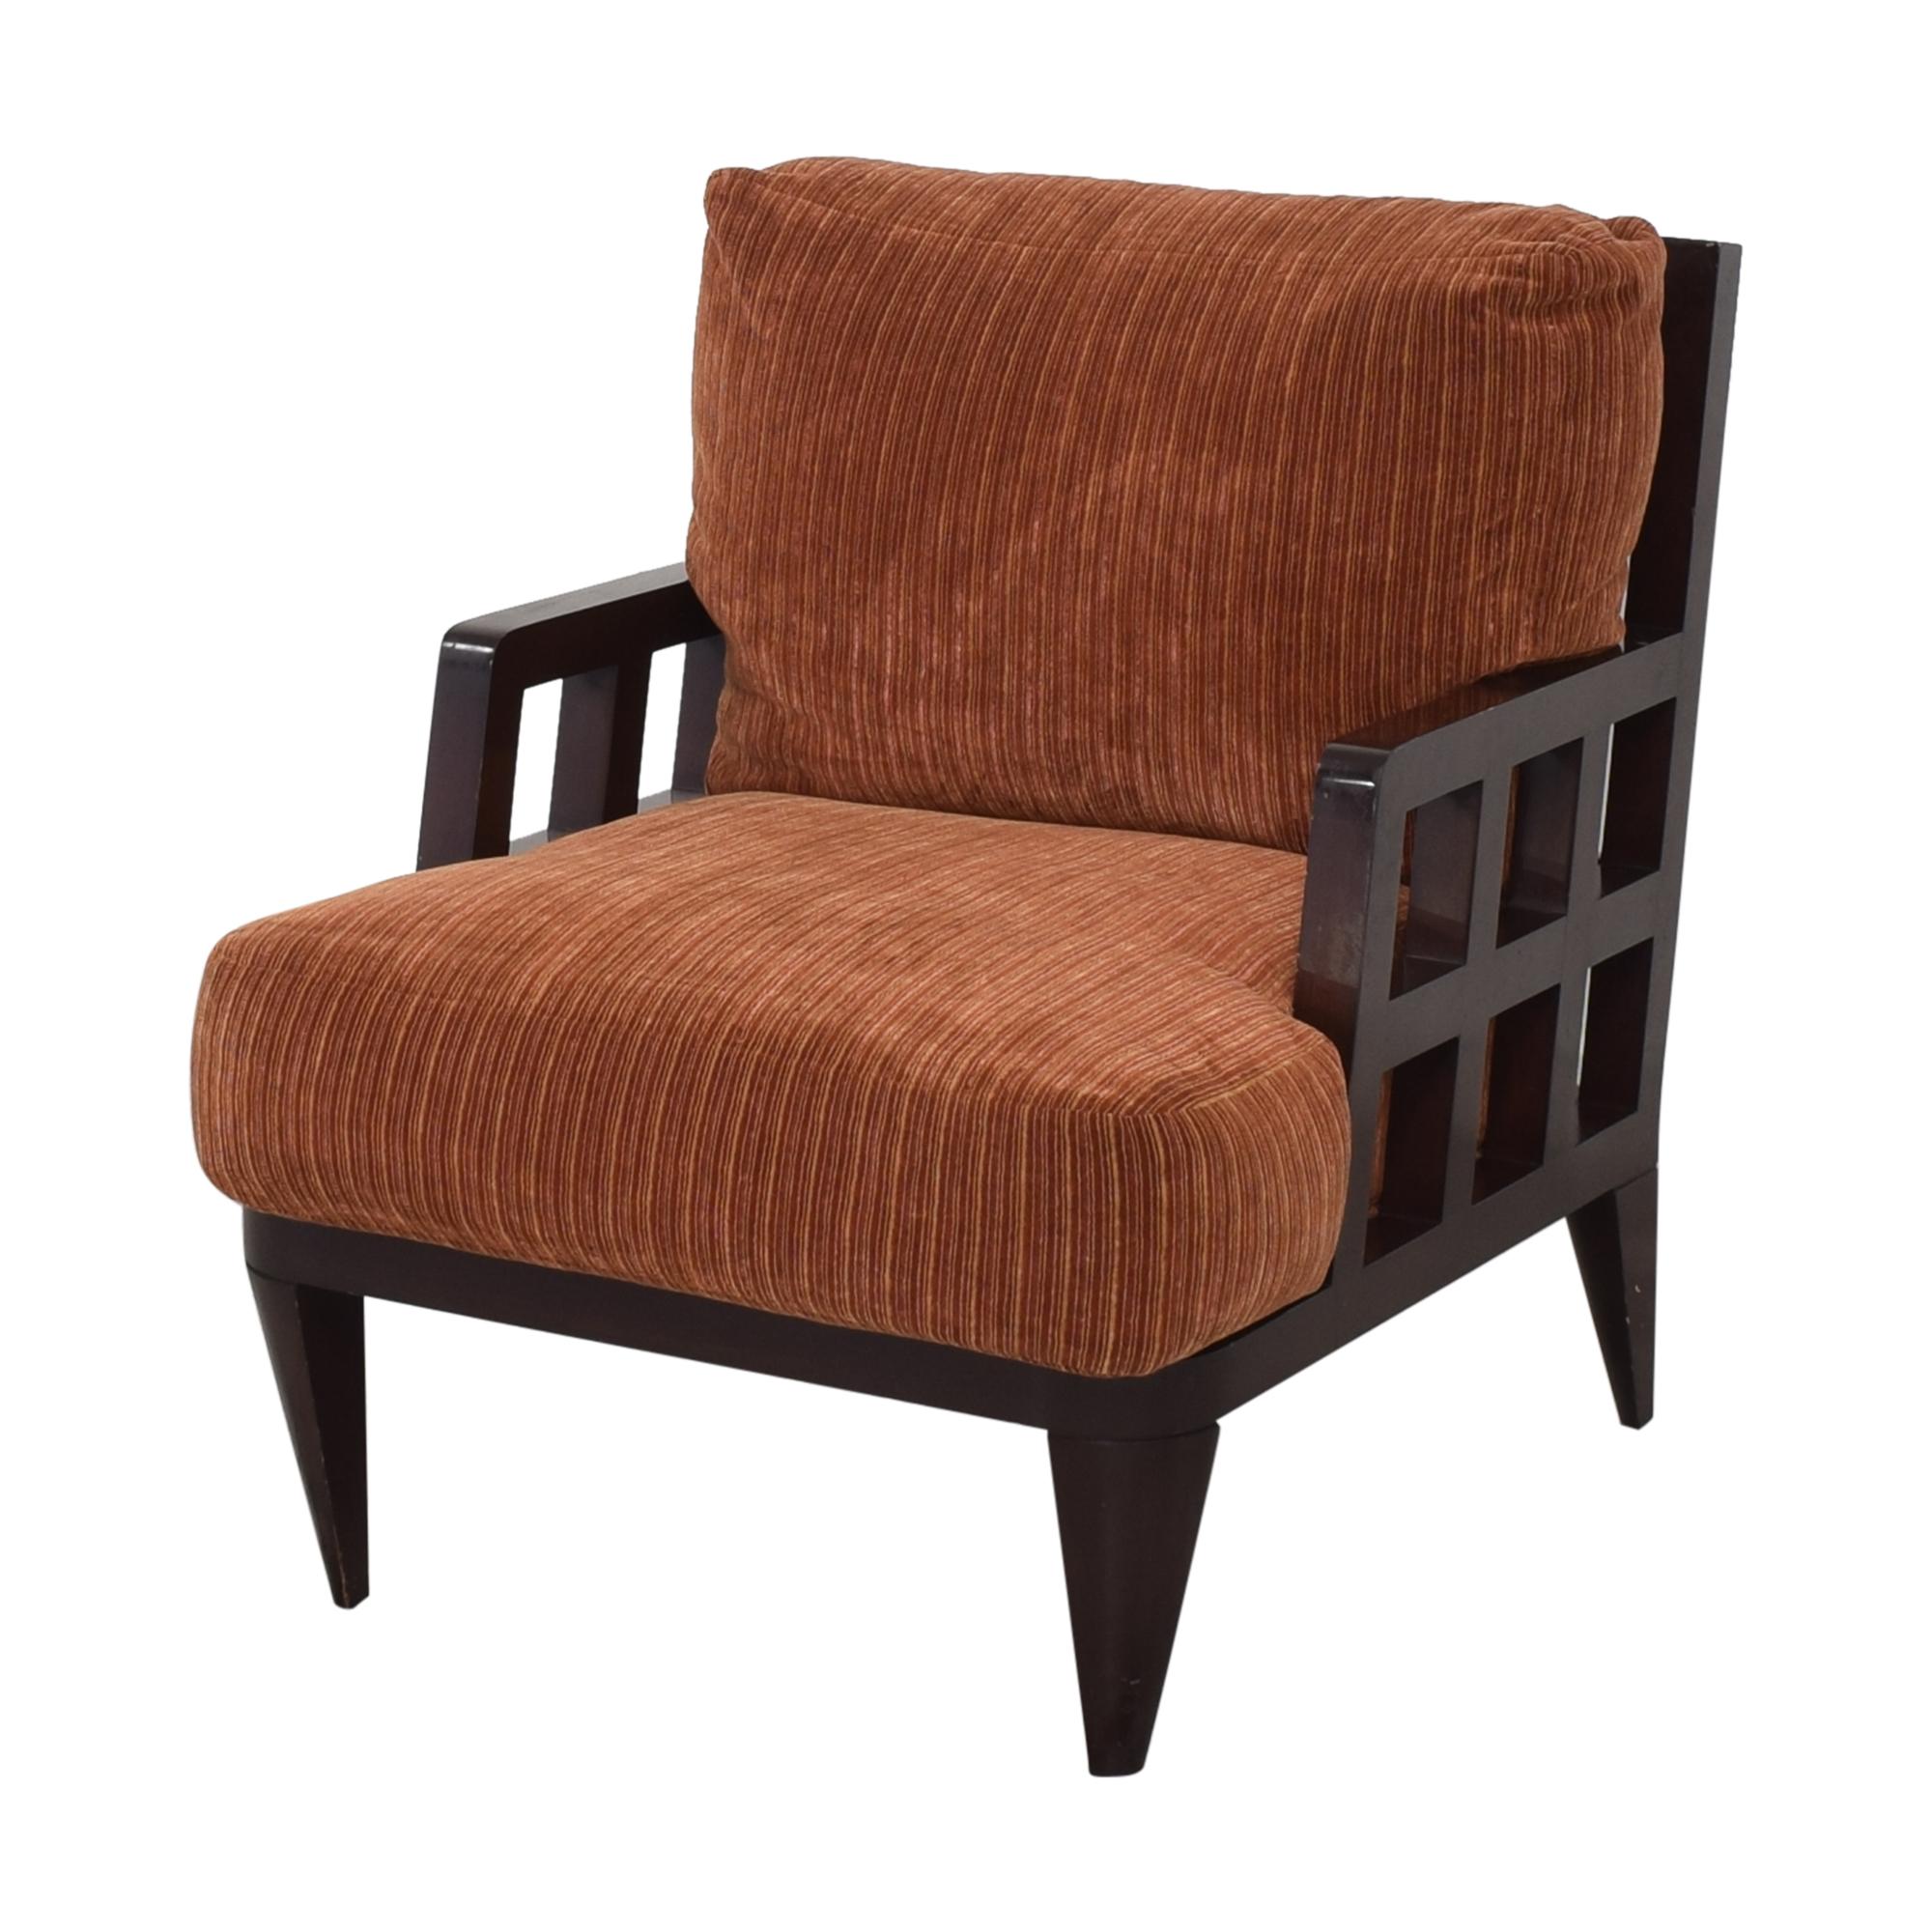 Berman   Rosetti Berman   Rosetti Fretwork Lounge Armchair ct